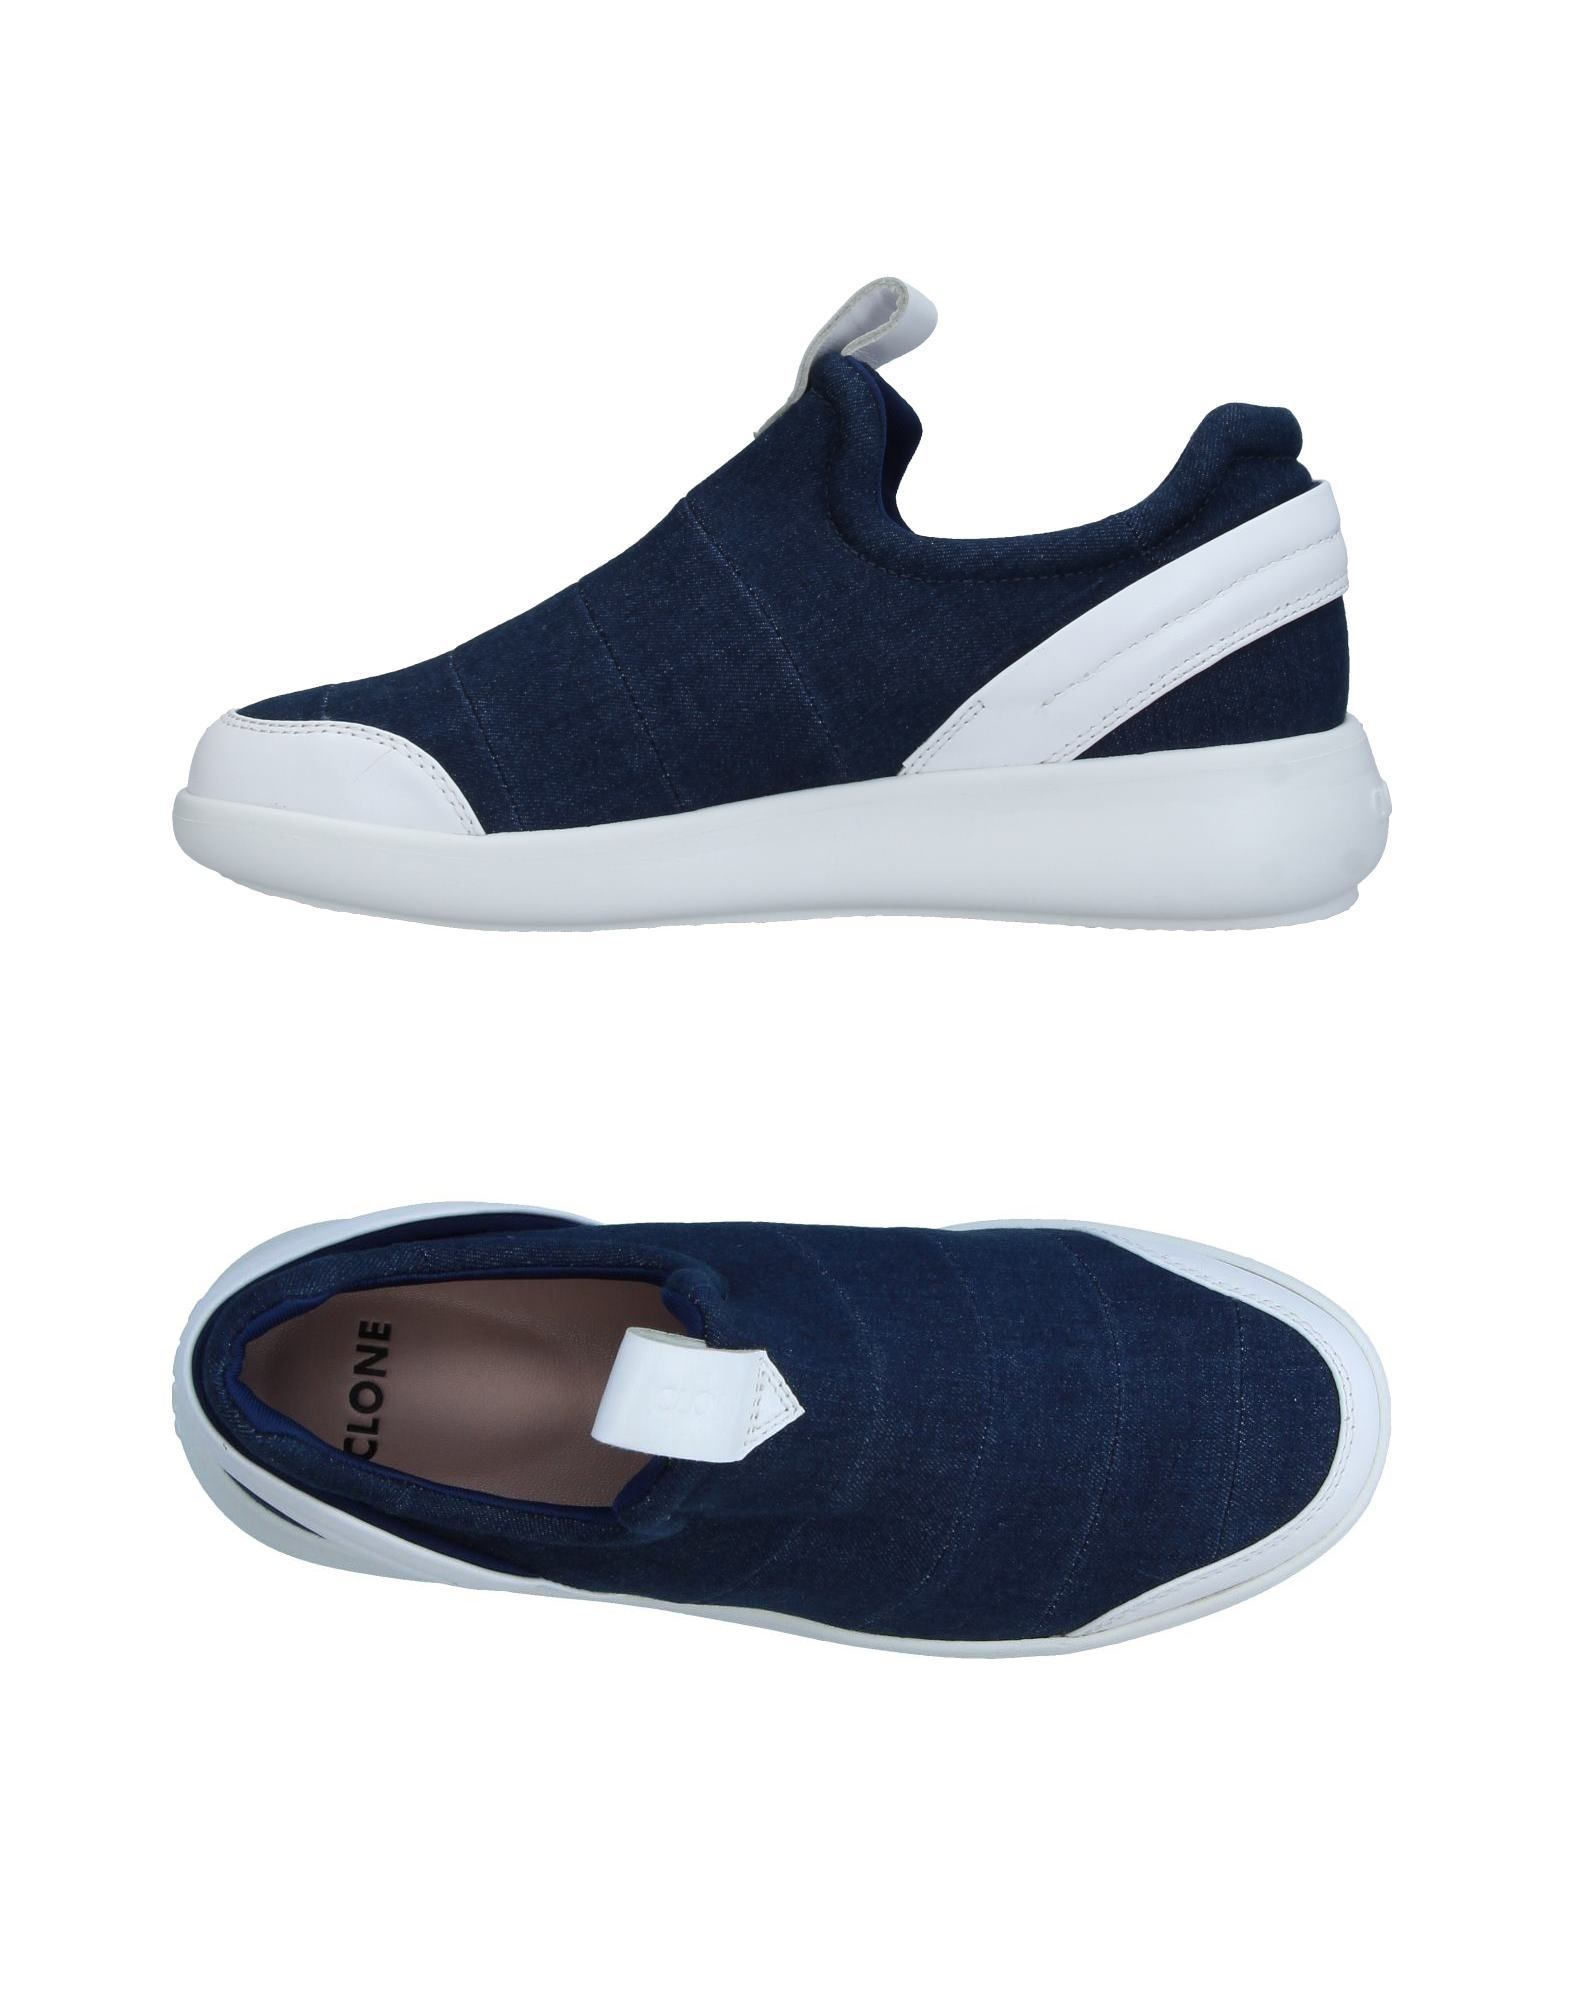 Clone Sneakers Damen  11348189JQ Gute Qualität beliebte Schuhe